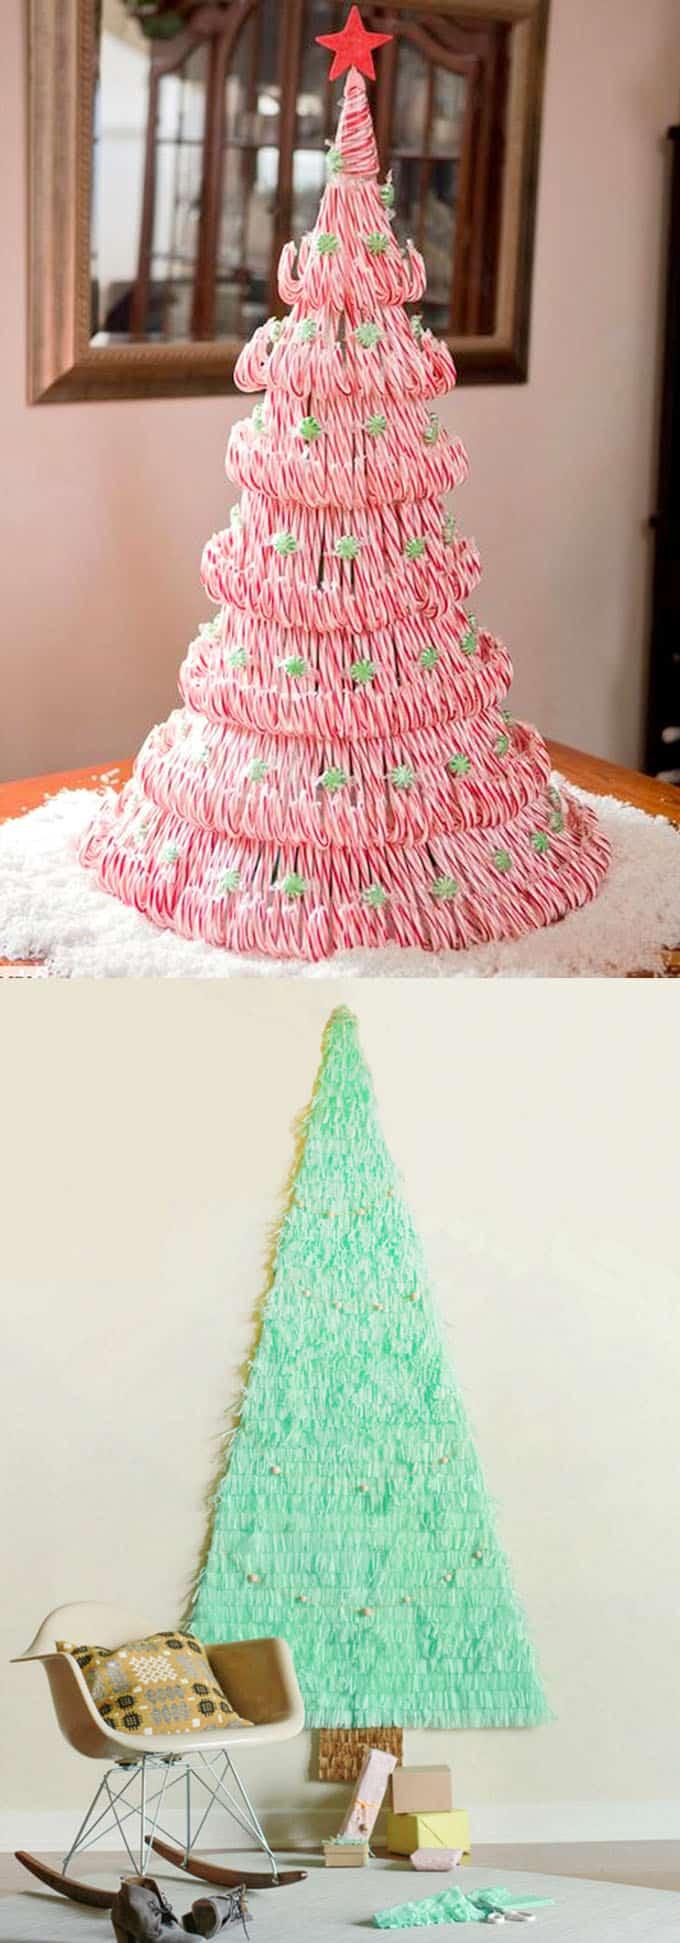 diy christmas tree ideas apieceofrainbow 12 - 48 Amazing Alternative Christmas Tree Ideas